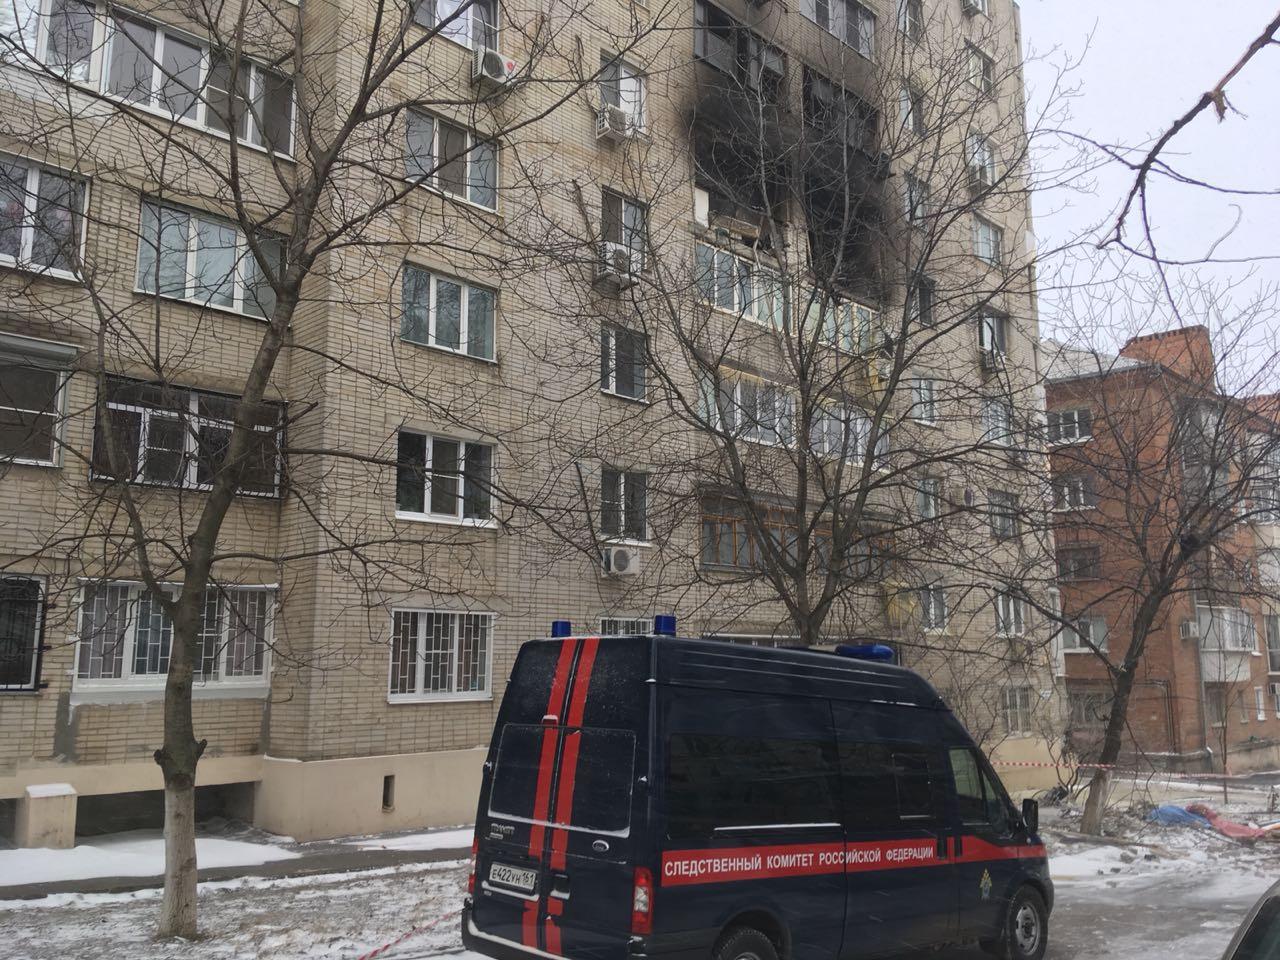 ВРостове-на-Дону при взрыве вжилом доме умер человек